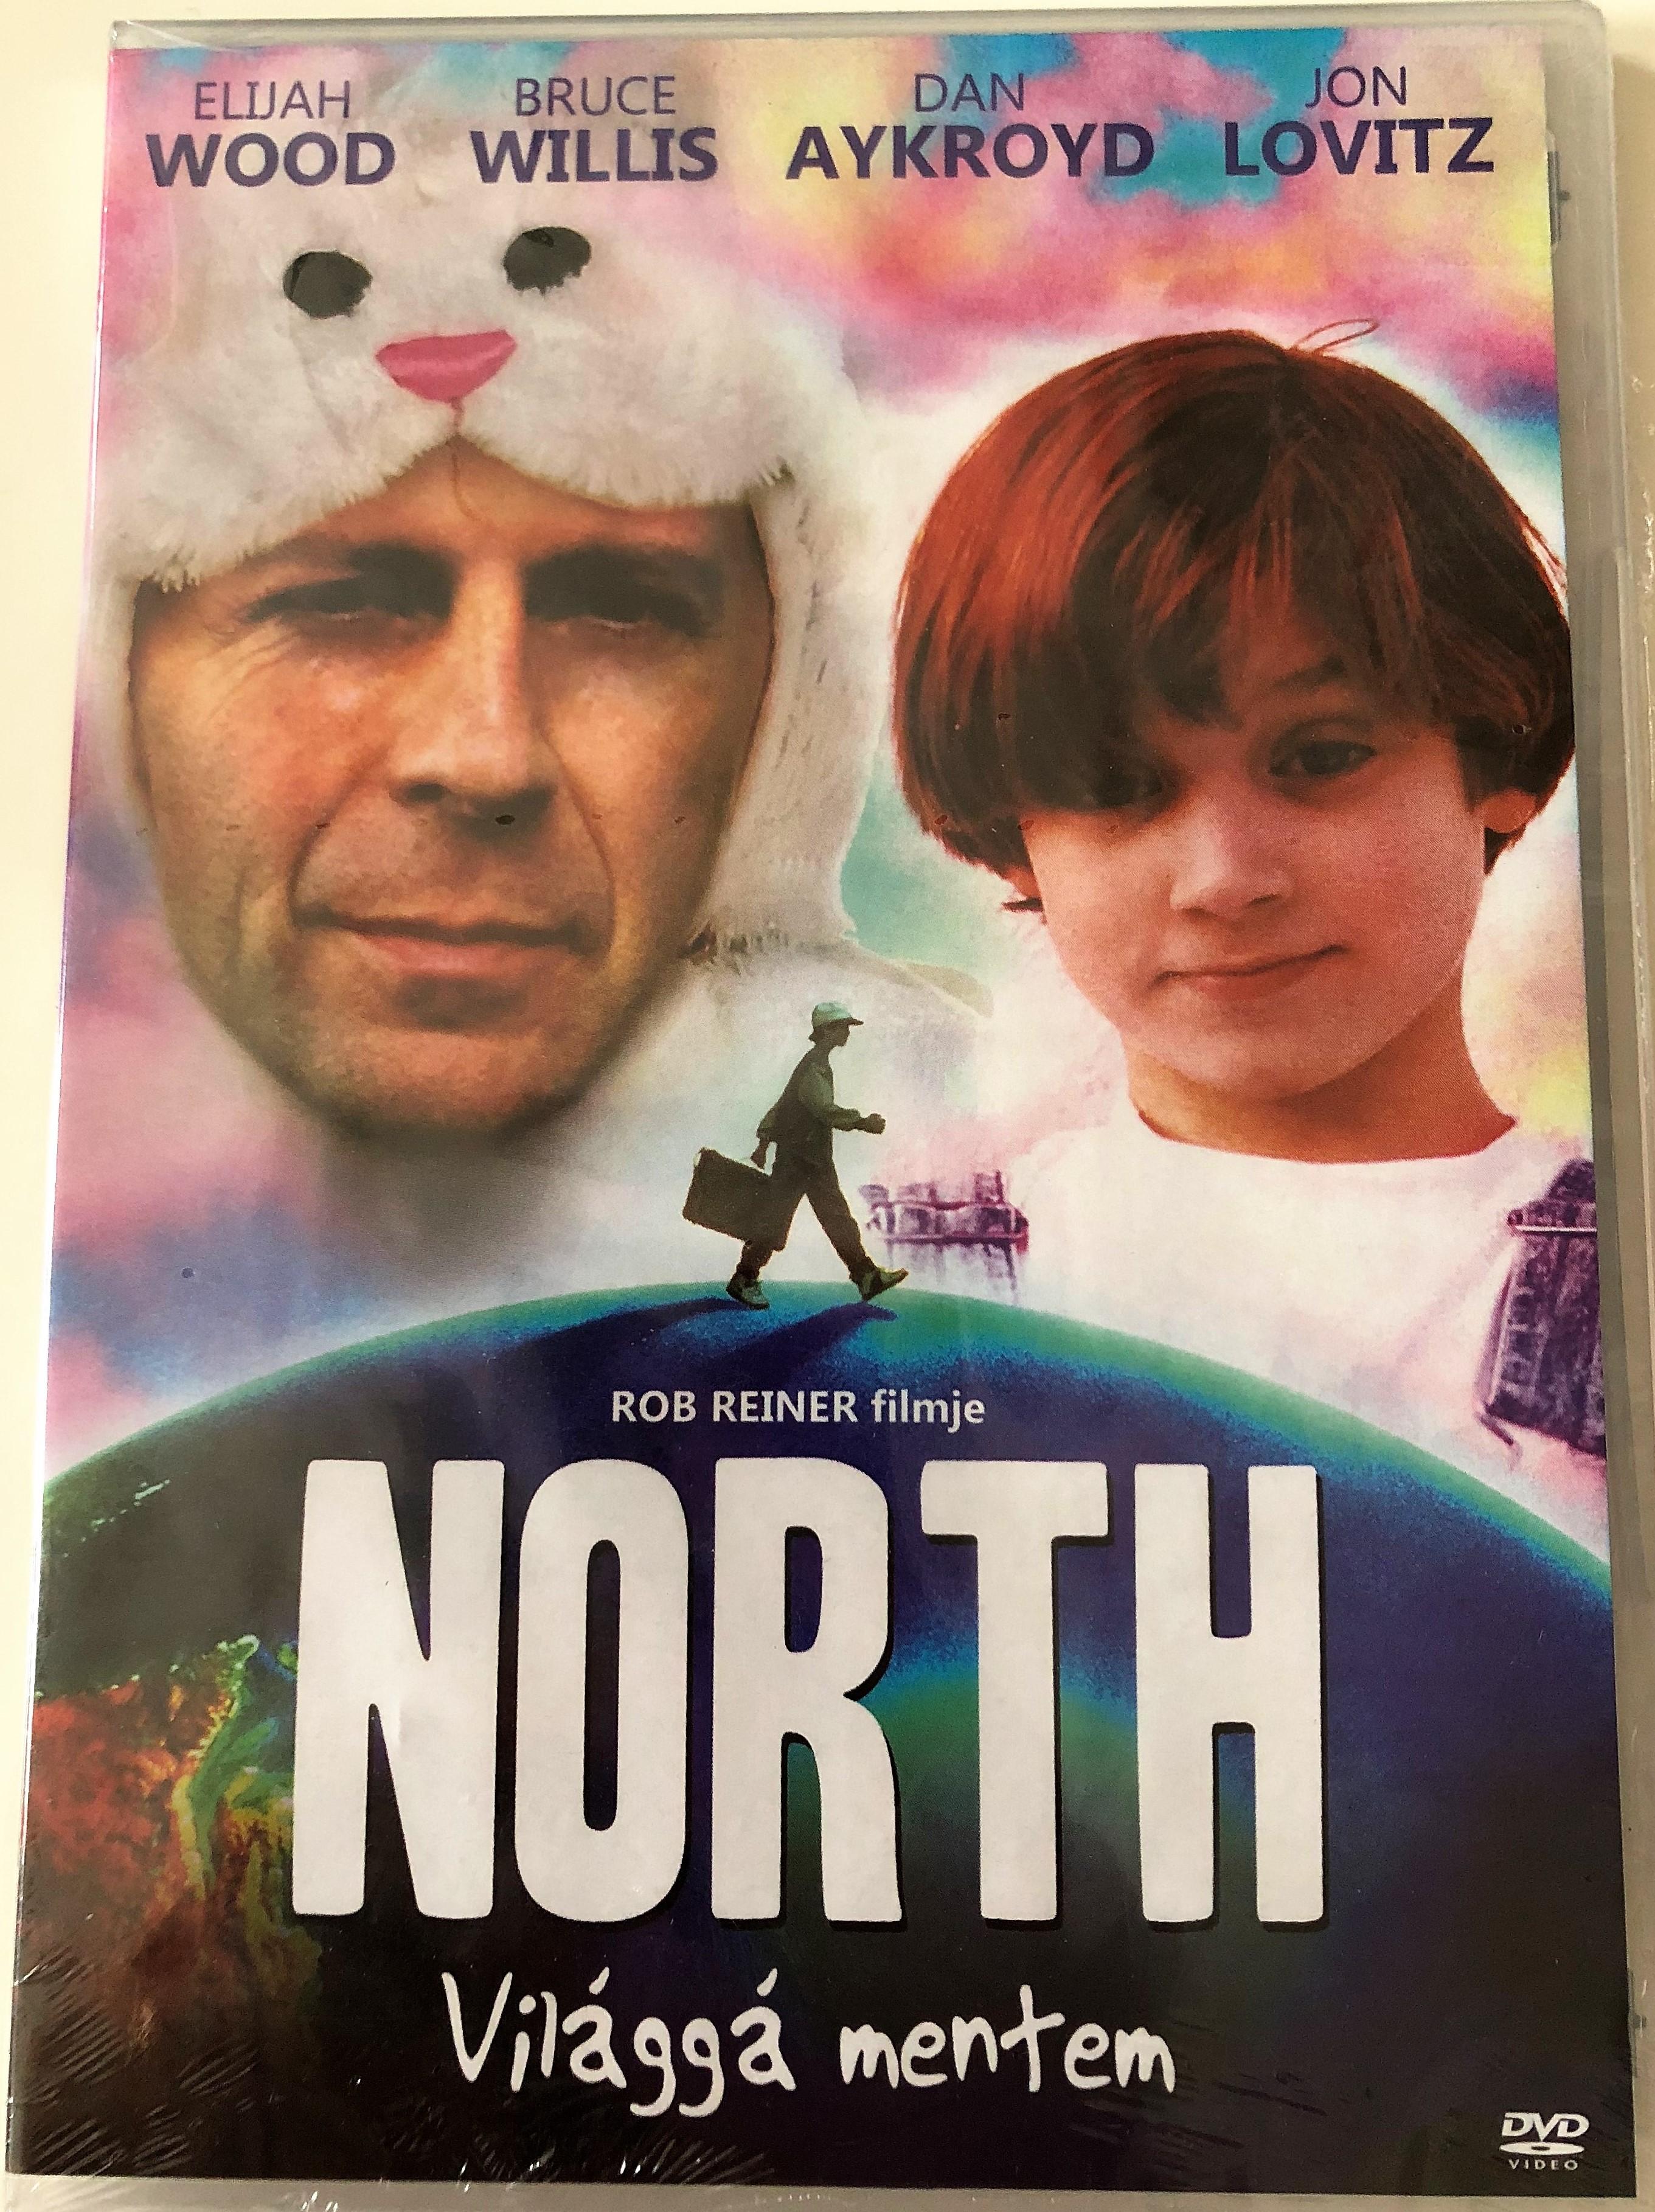 vil-gg-mentem-dvd-1994-north-directed-by-rob-reiner-starring-elijah-wood-bruce-willis-dan-aykroyd-jon-lovitz-1-.jpg